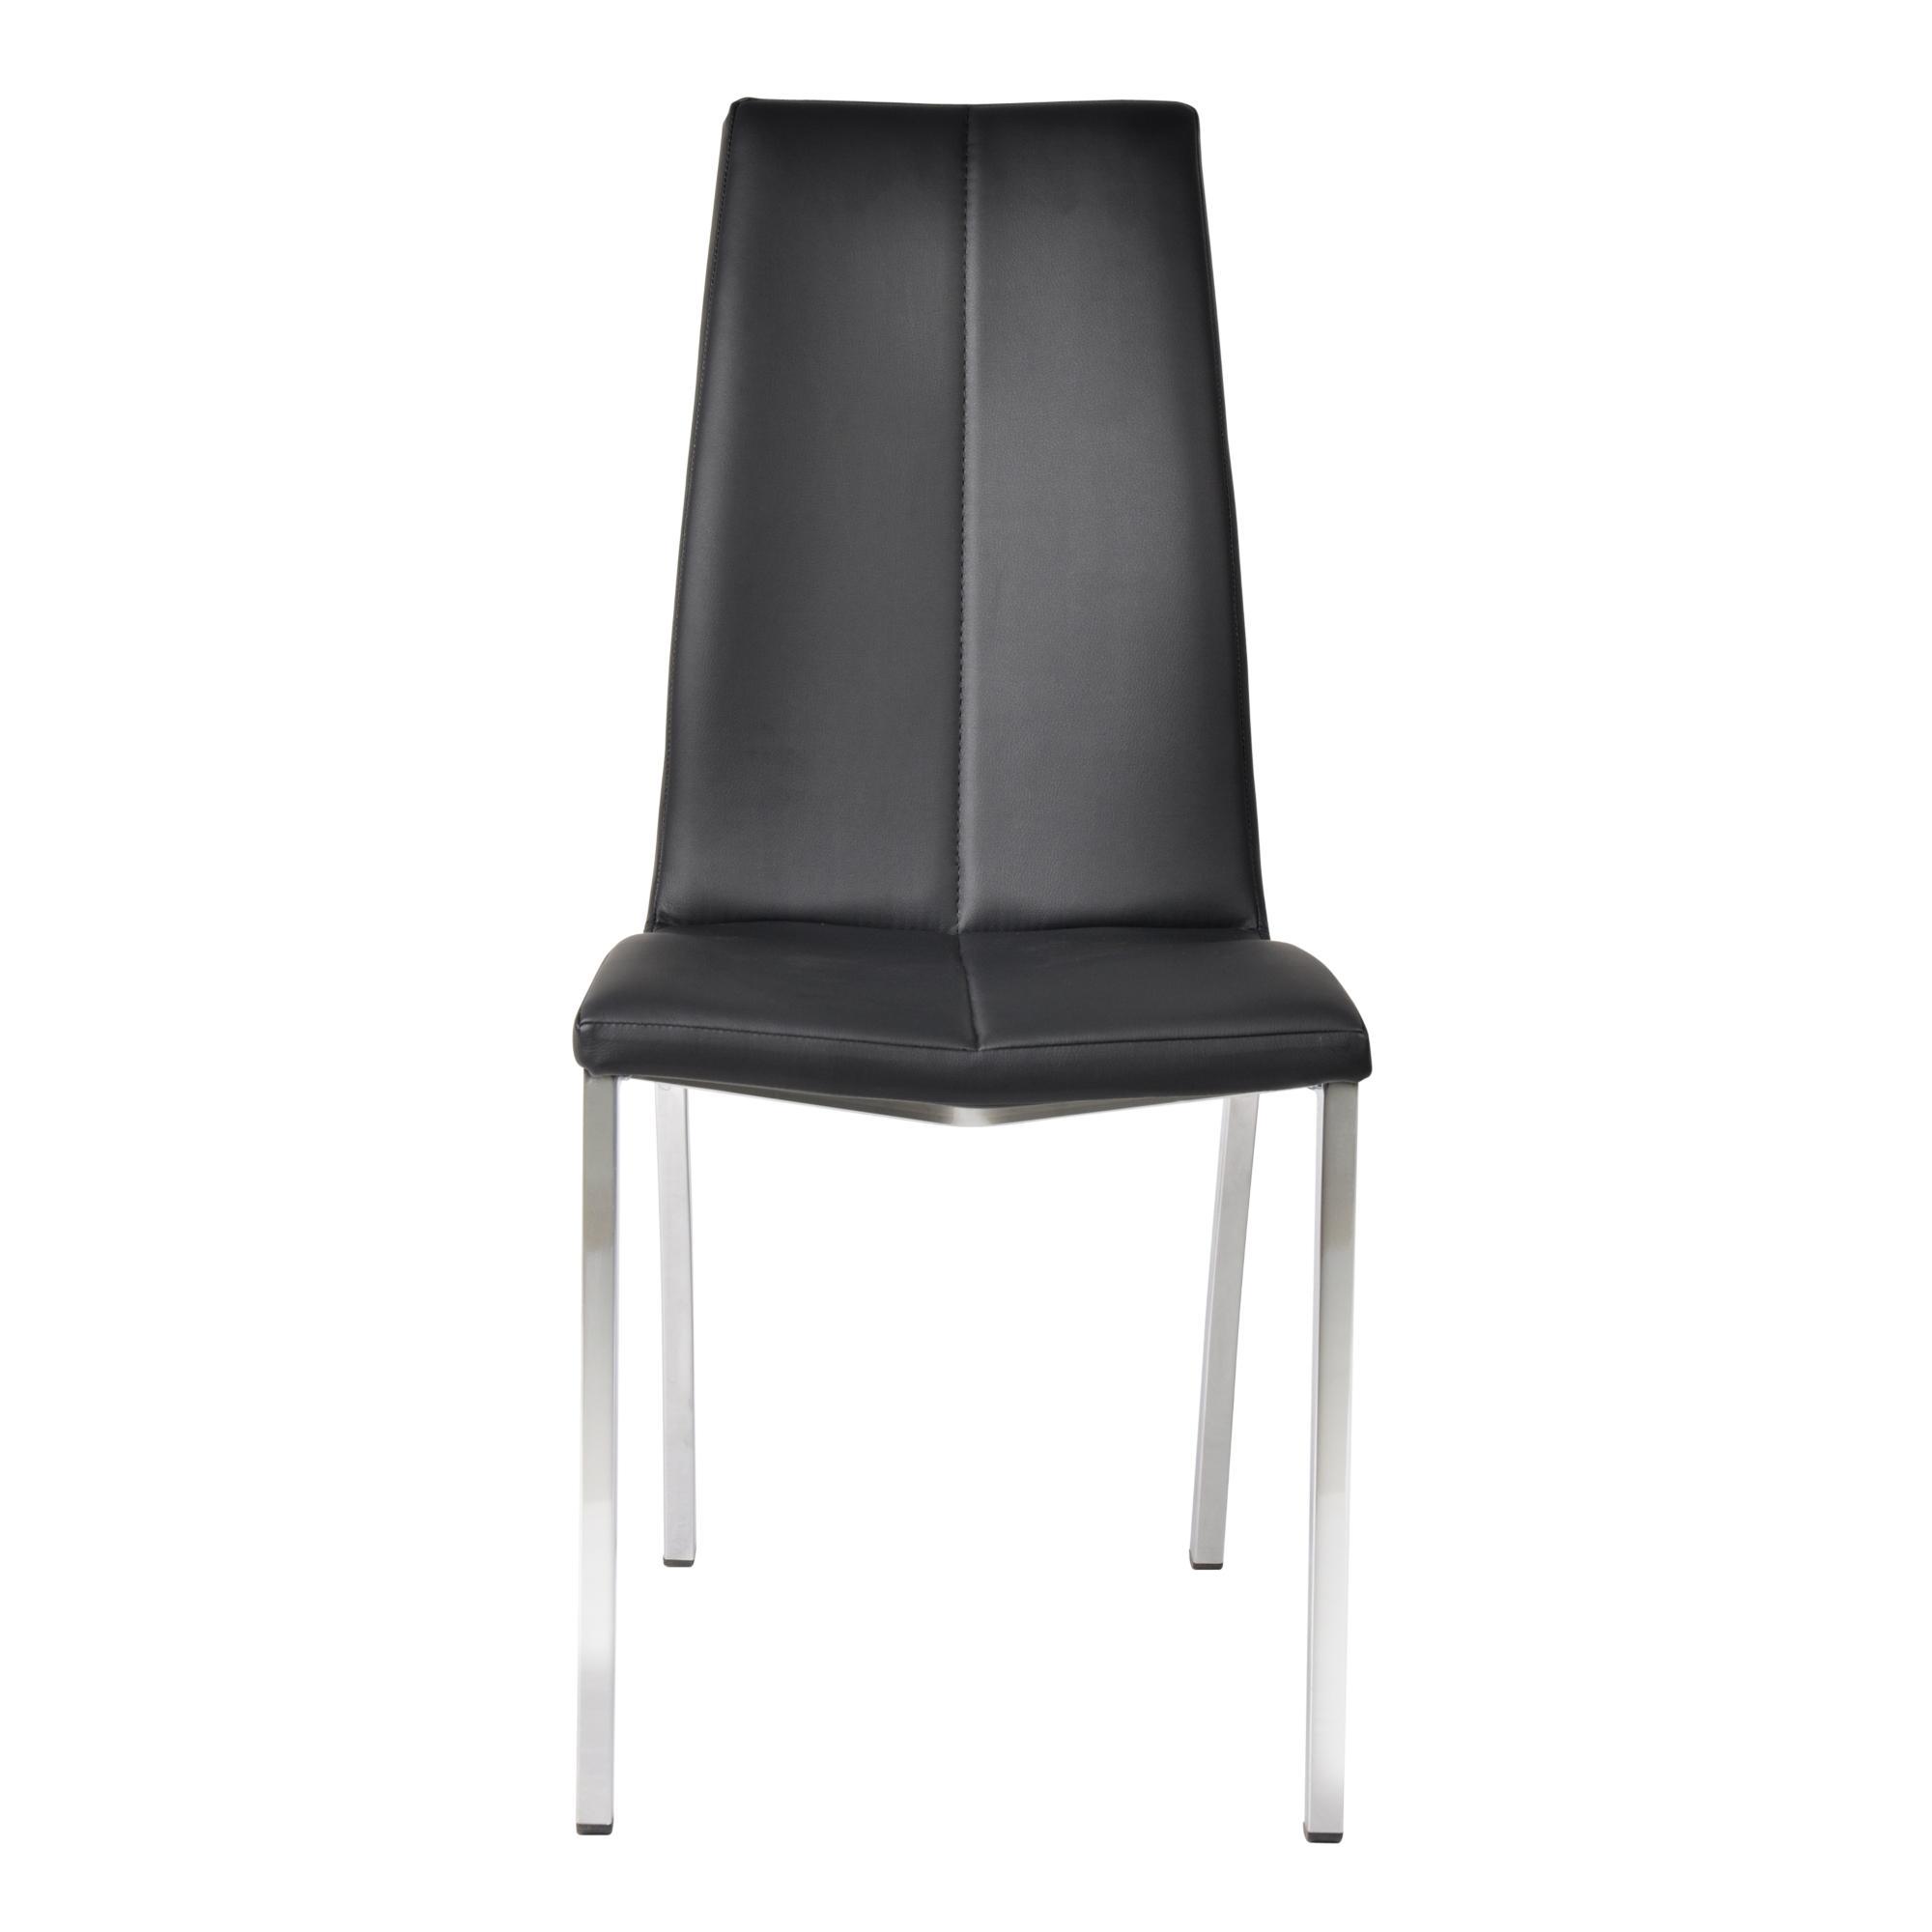 Milo II Dining Chair, Set of 2 (Black/Chrome)